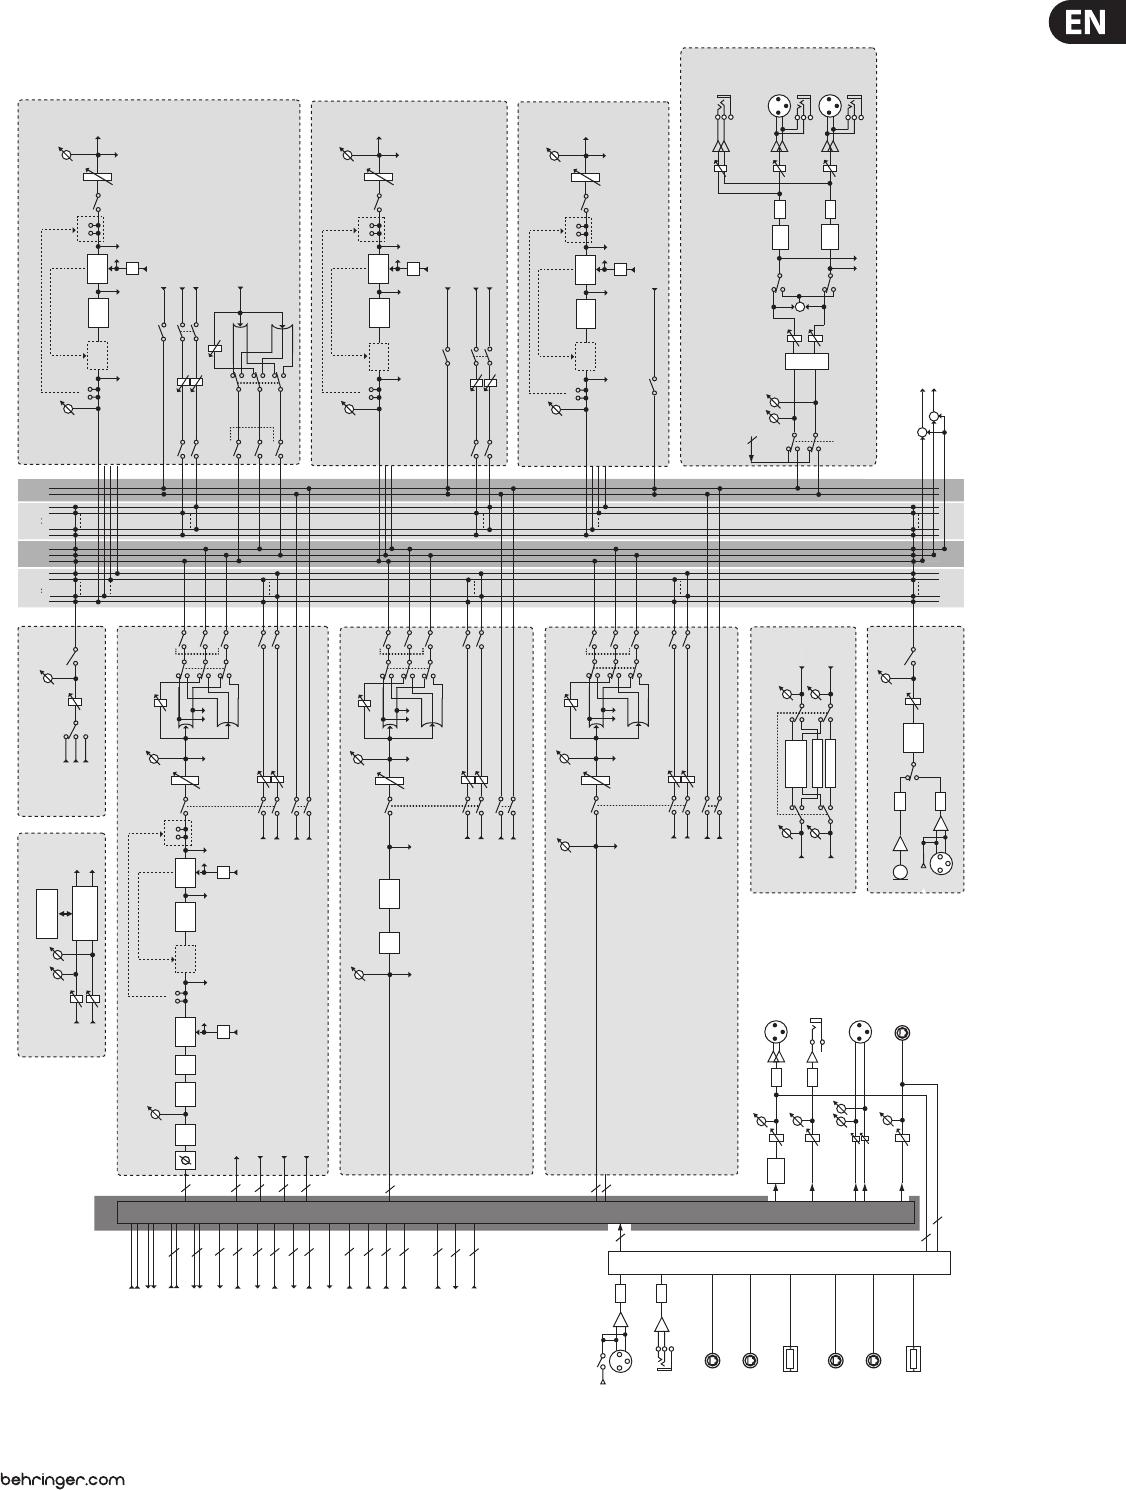 Handleiding Behringer X32  Pagina 65 Van 70   English